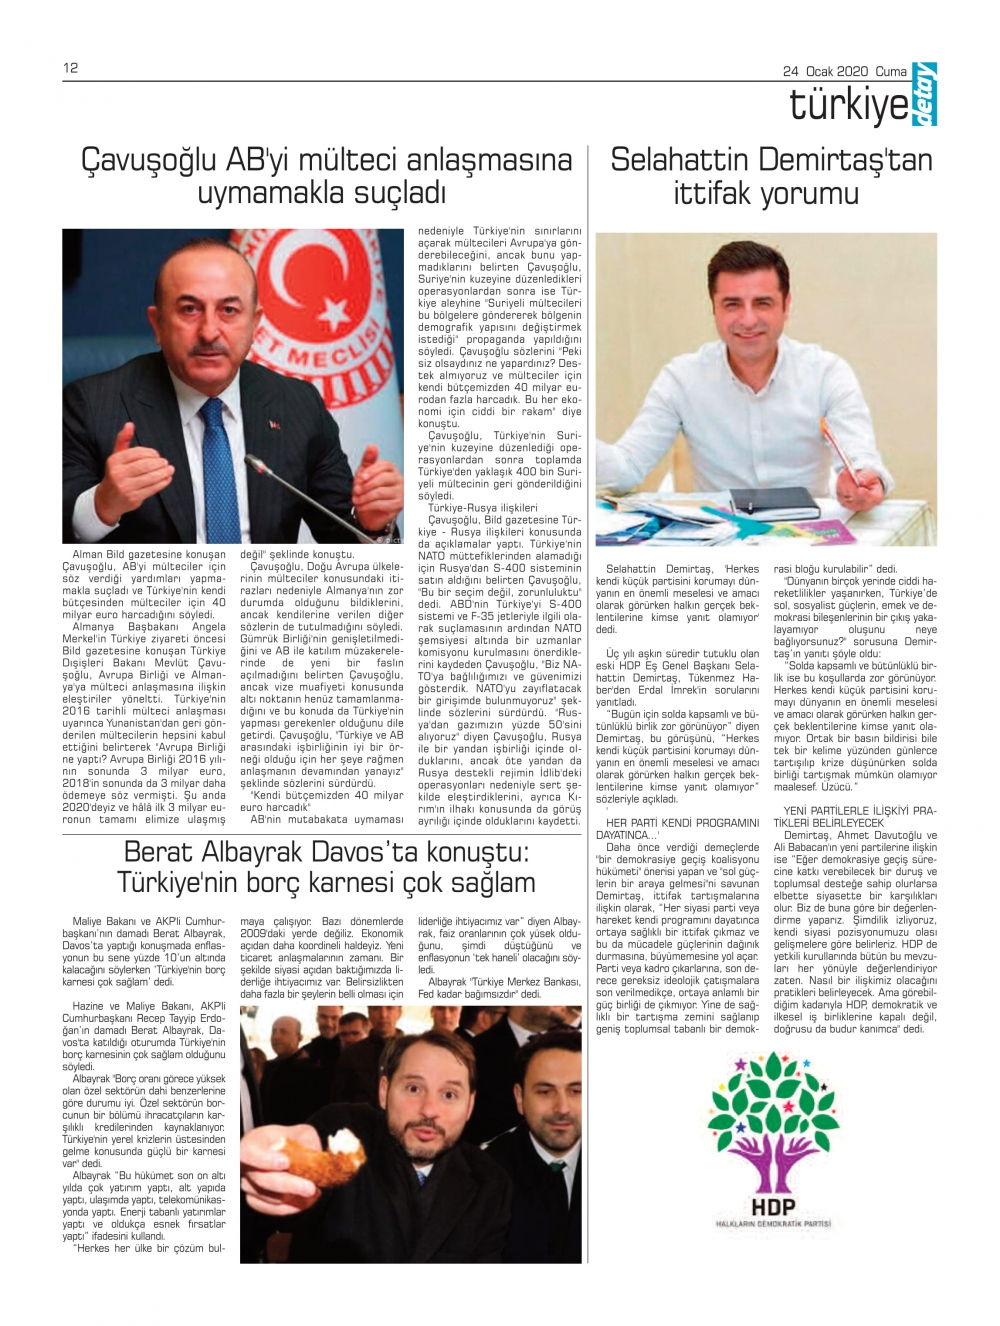 Detay Gazetes 24 Ocak 2020 galerisi resim 12